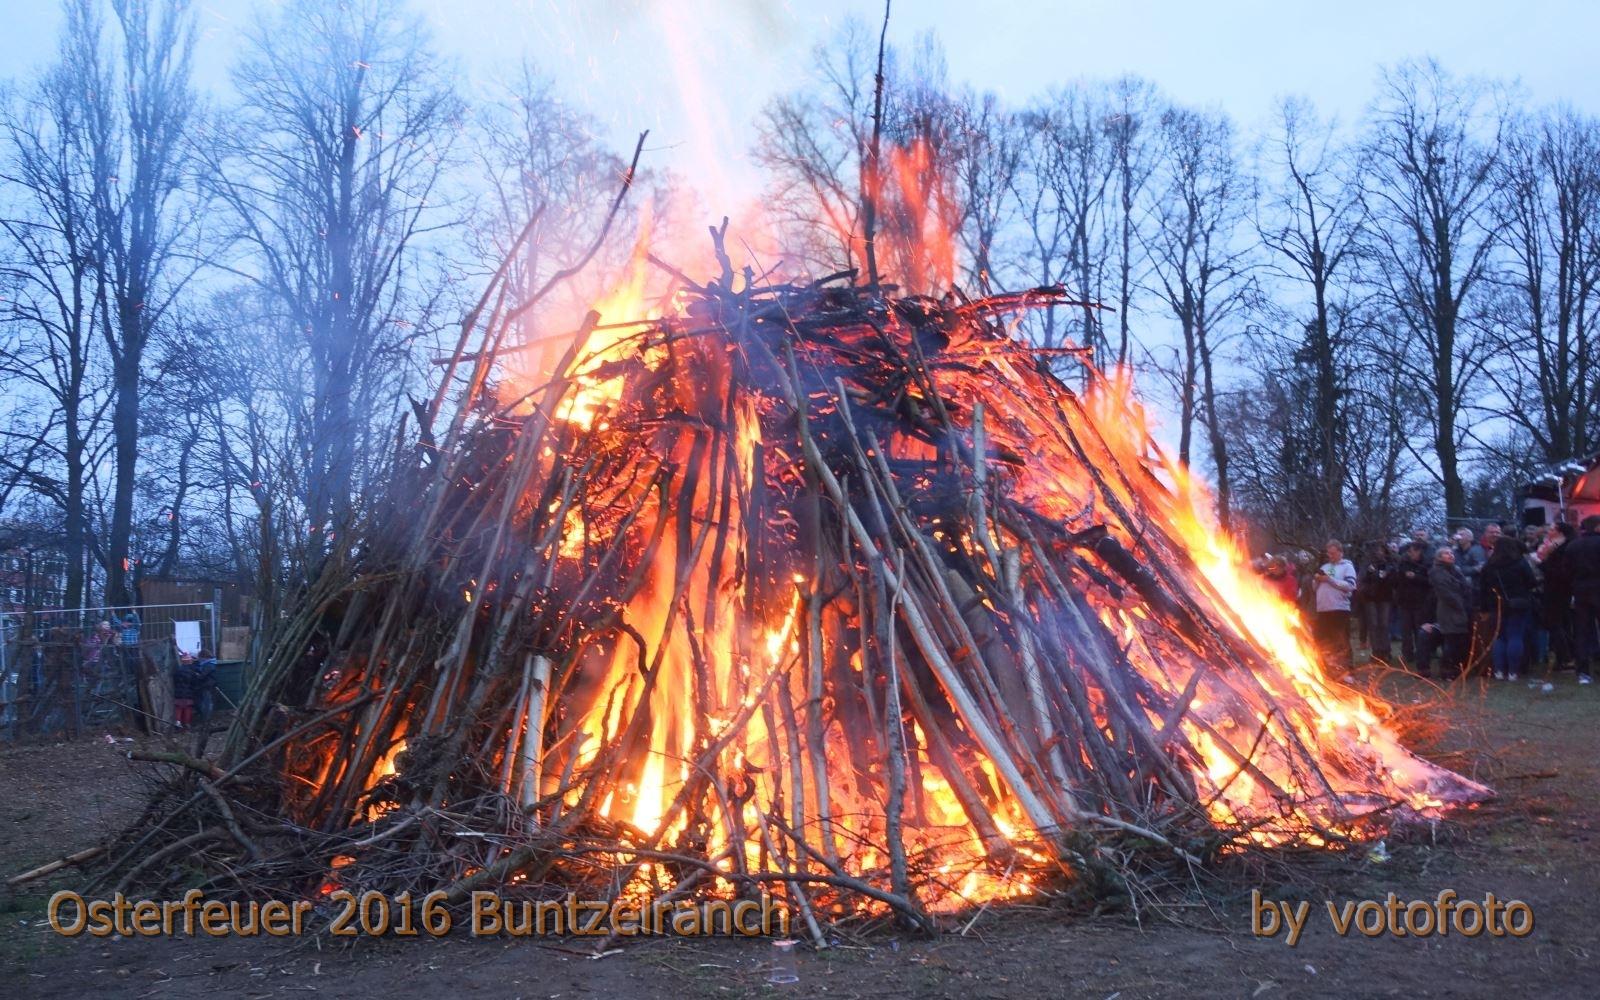 Osterfeuer 2016 Buntzelranch  143